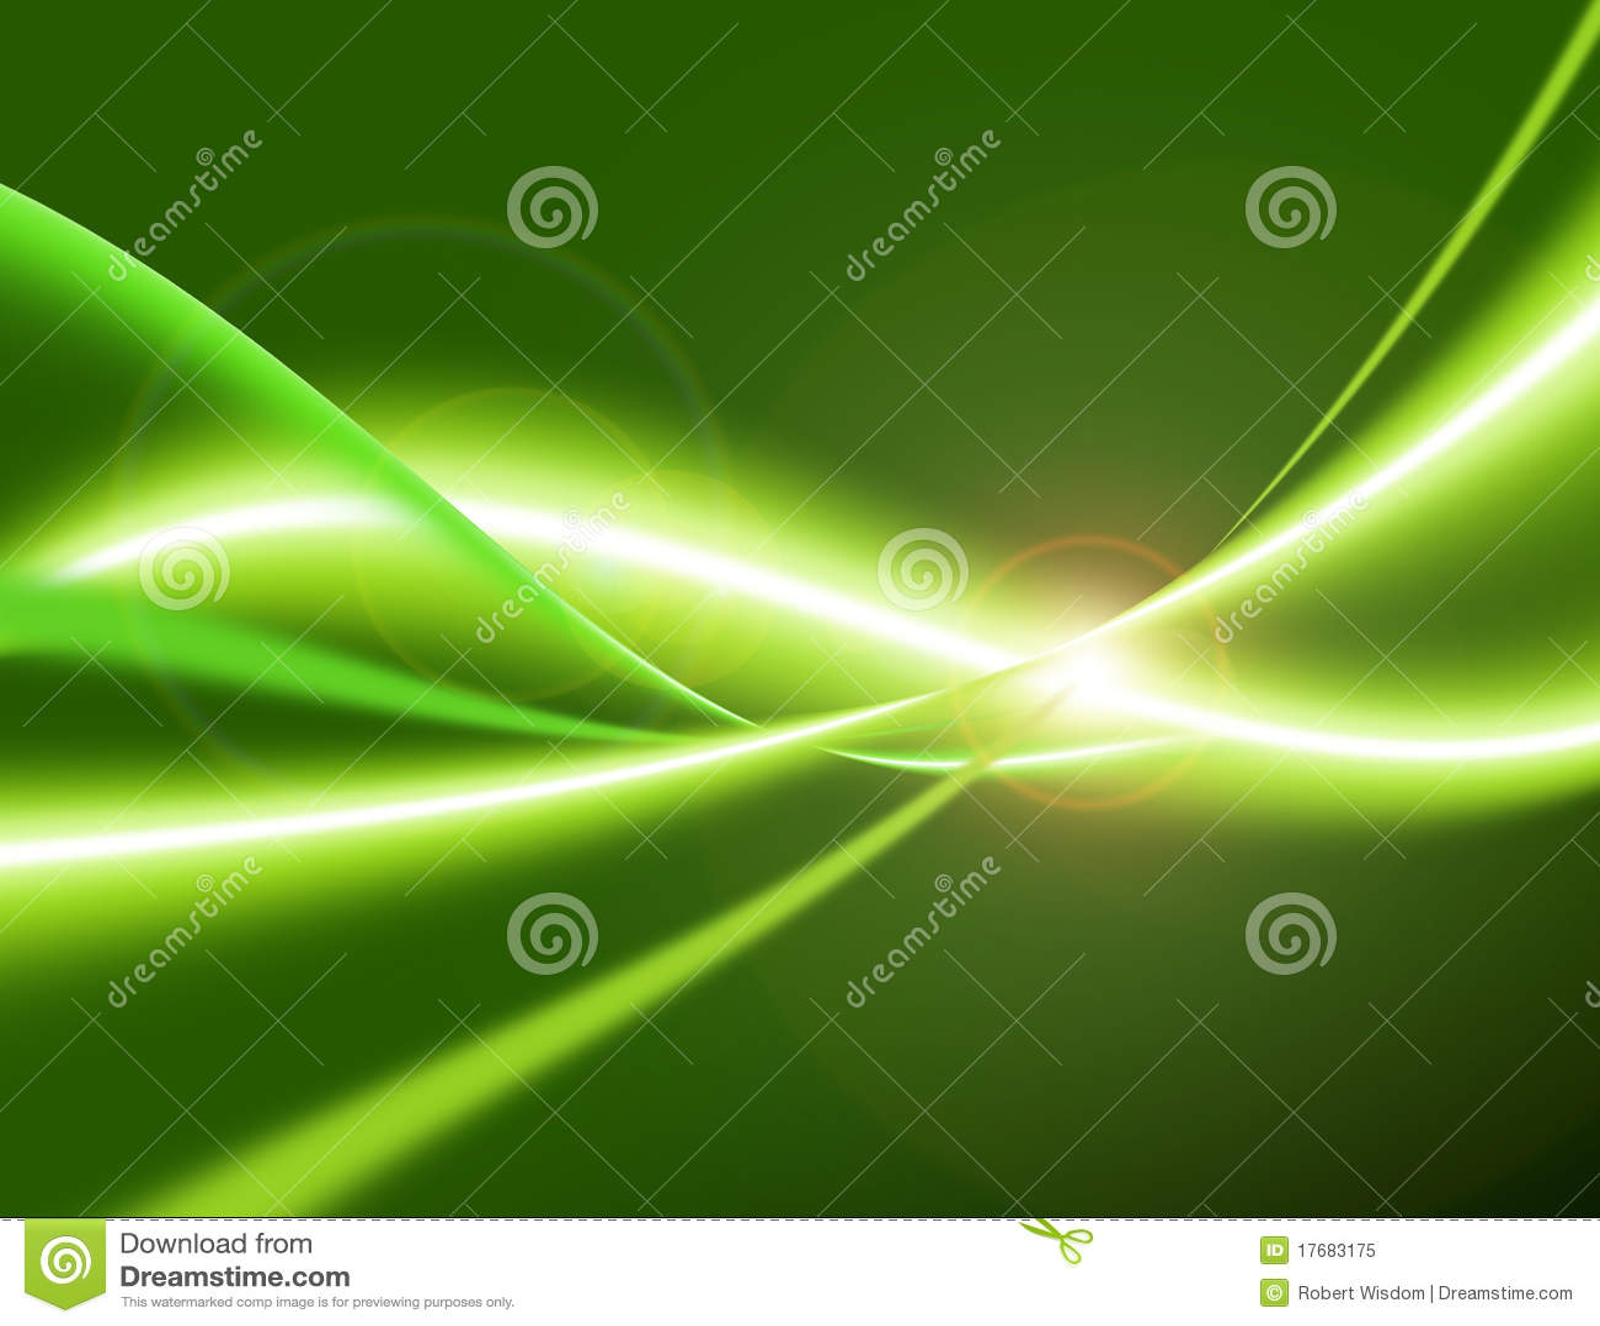 green energy royalty free stock photo image 17683175